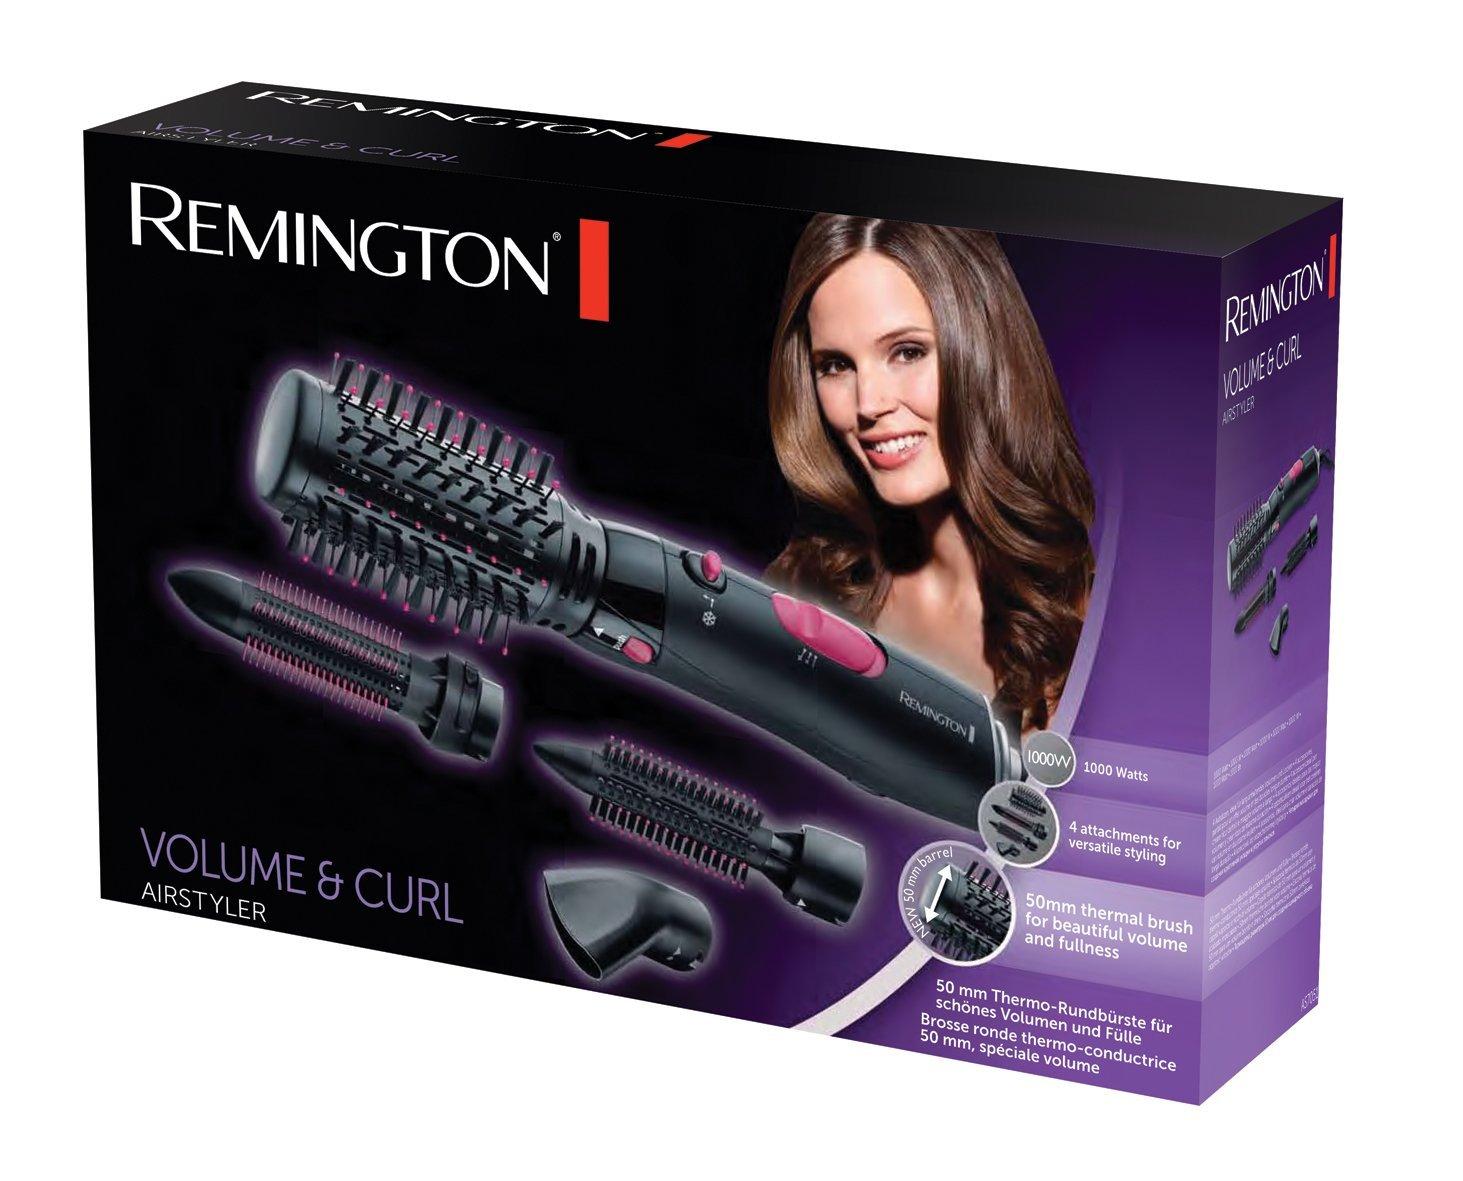 Fen-daraq Remington AS7051  - 3